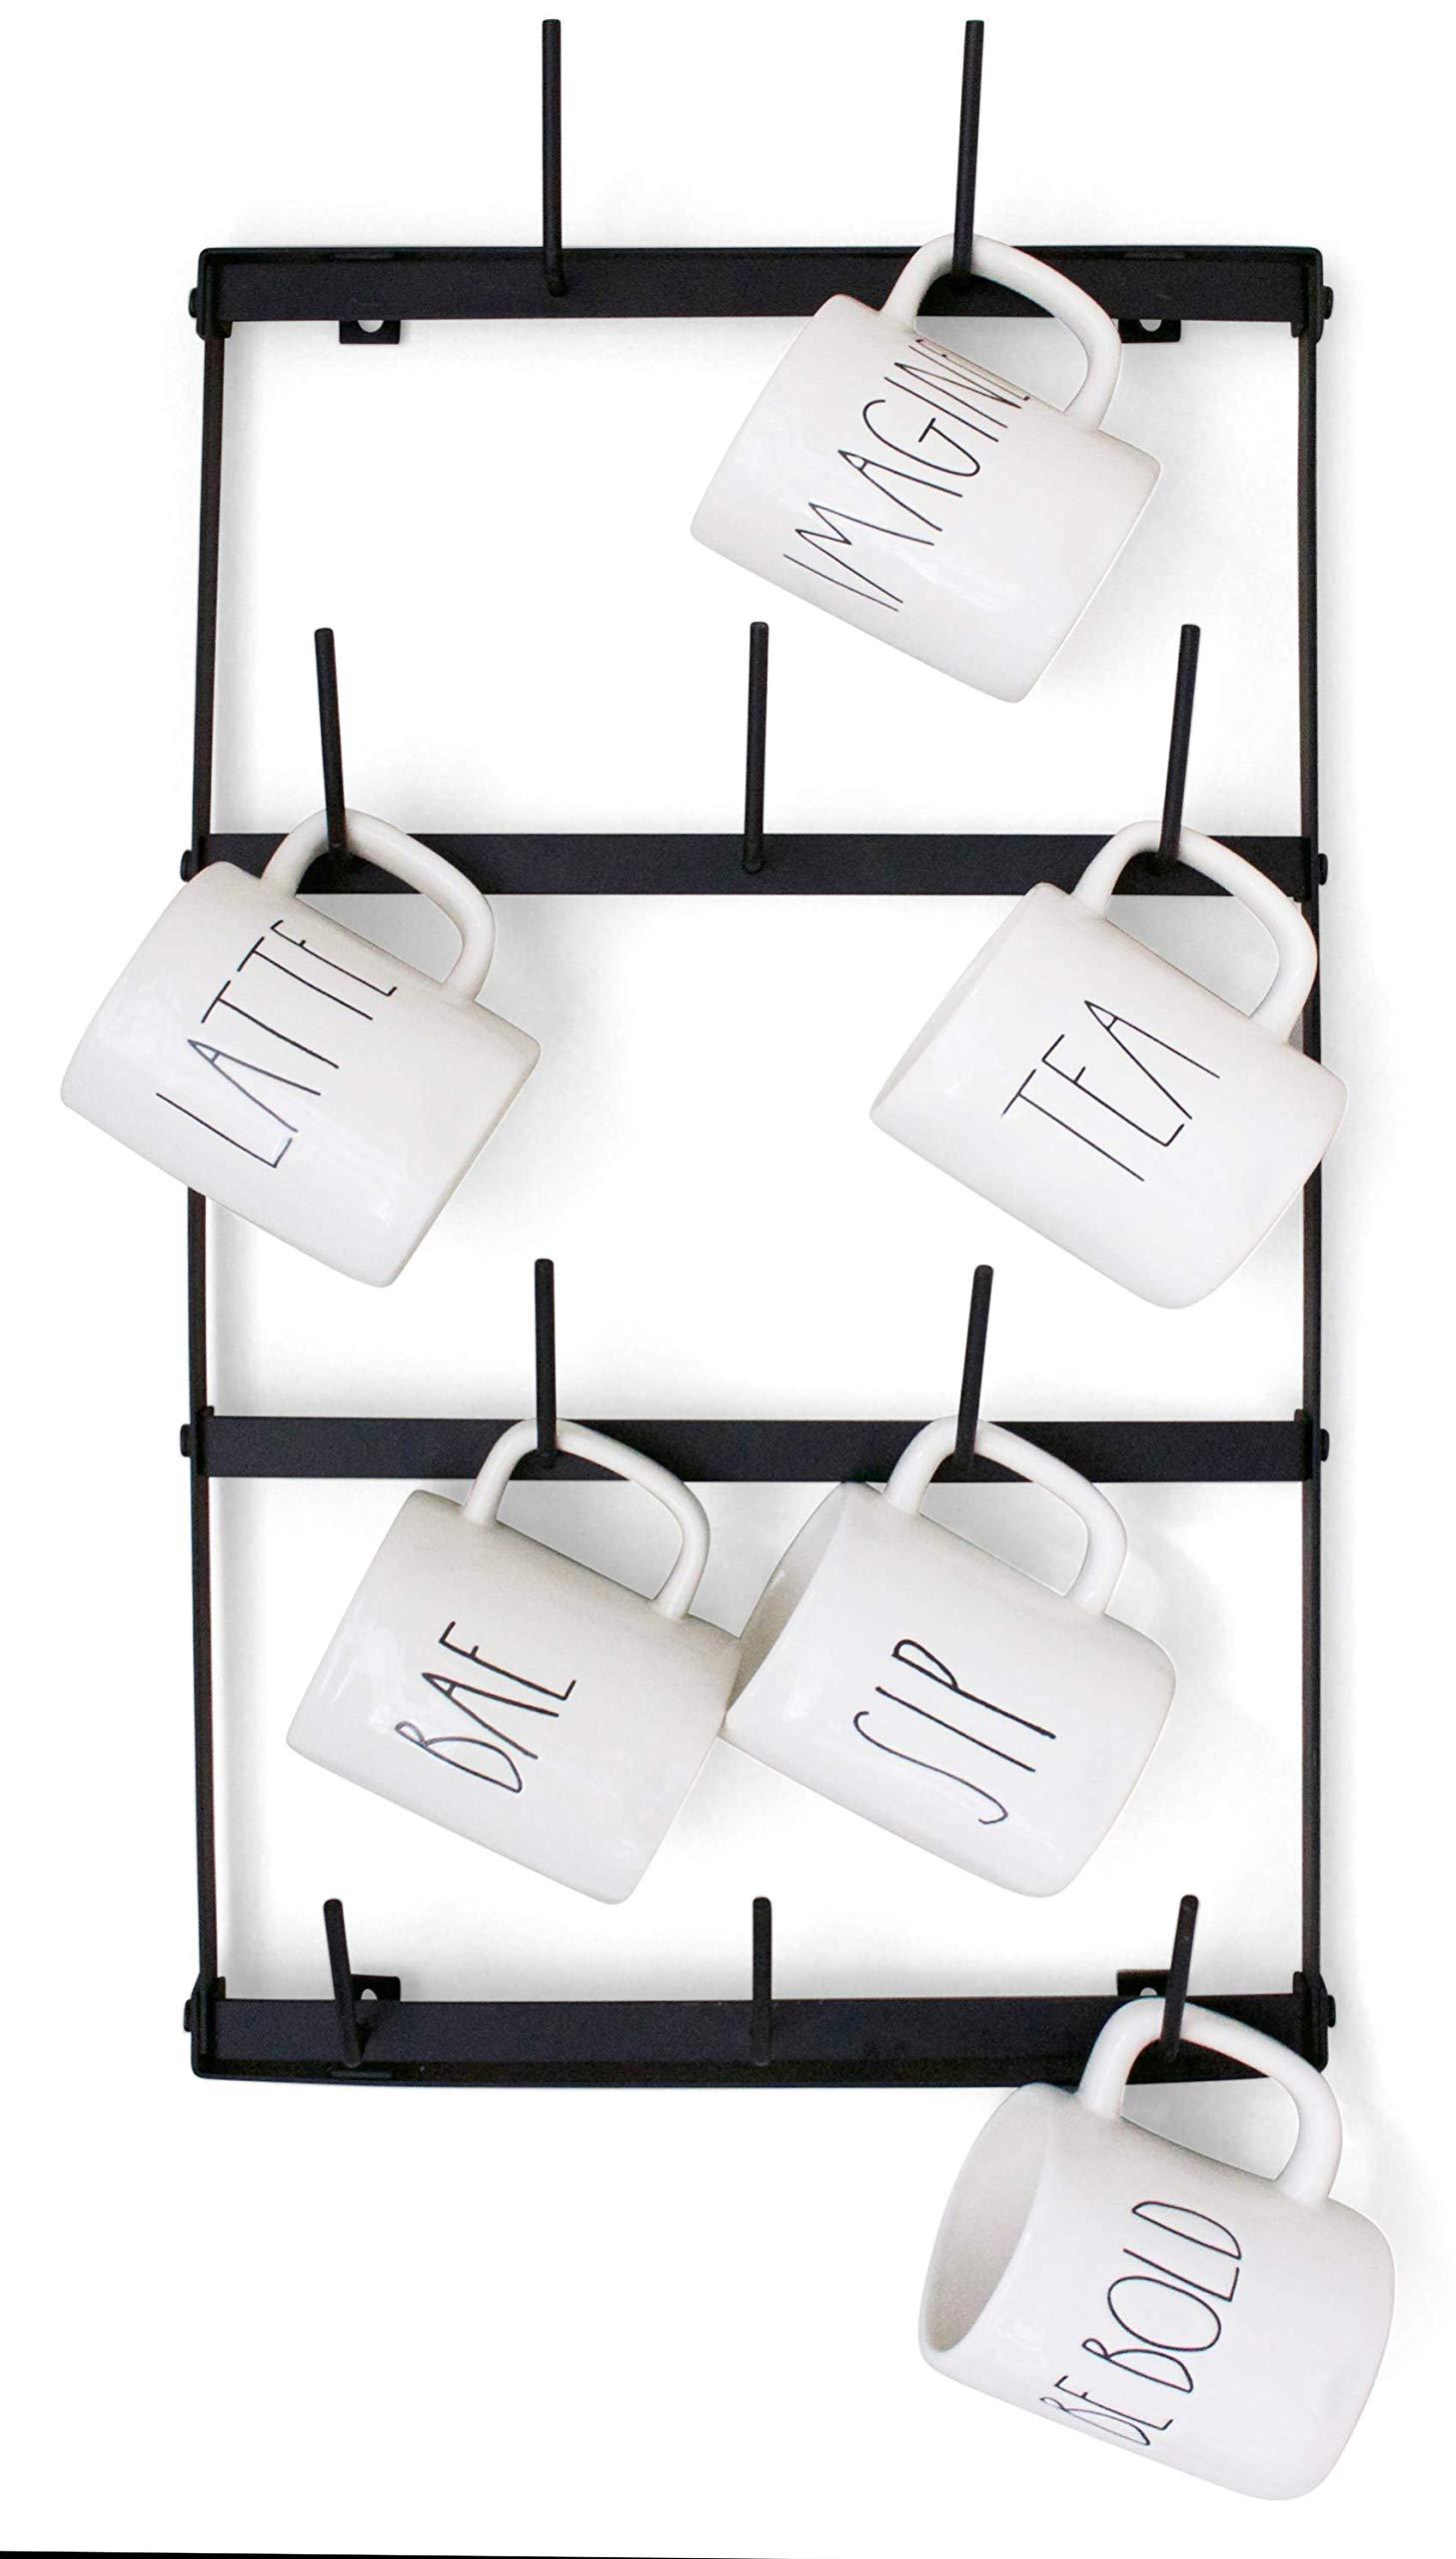 Claimed Corner Mini Wall Mounted Mug Rack - 4 Row Metal Storage Display Organizer For Coffee Mugs, Tea Cups, Mason Jars, and More.